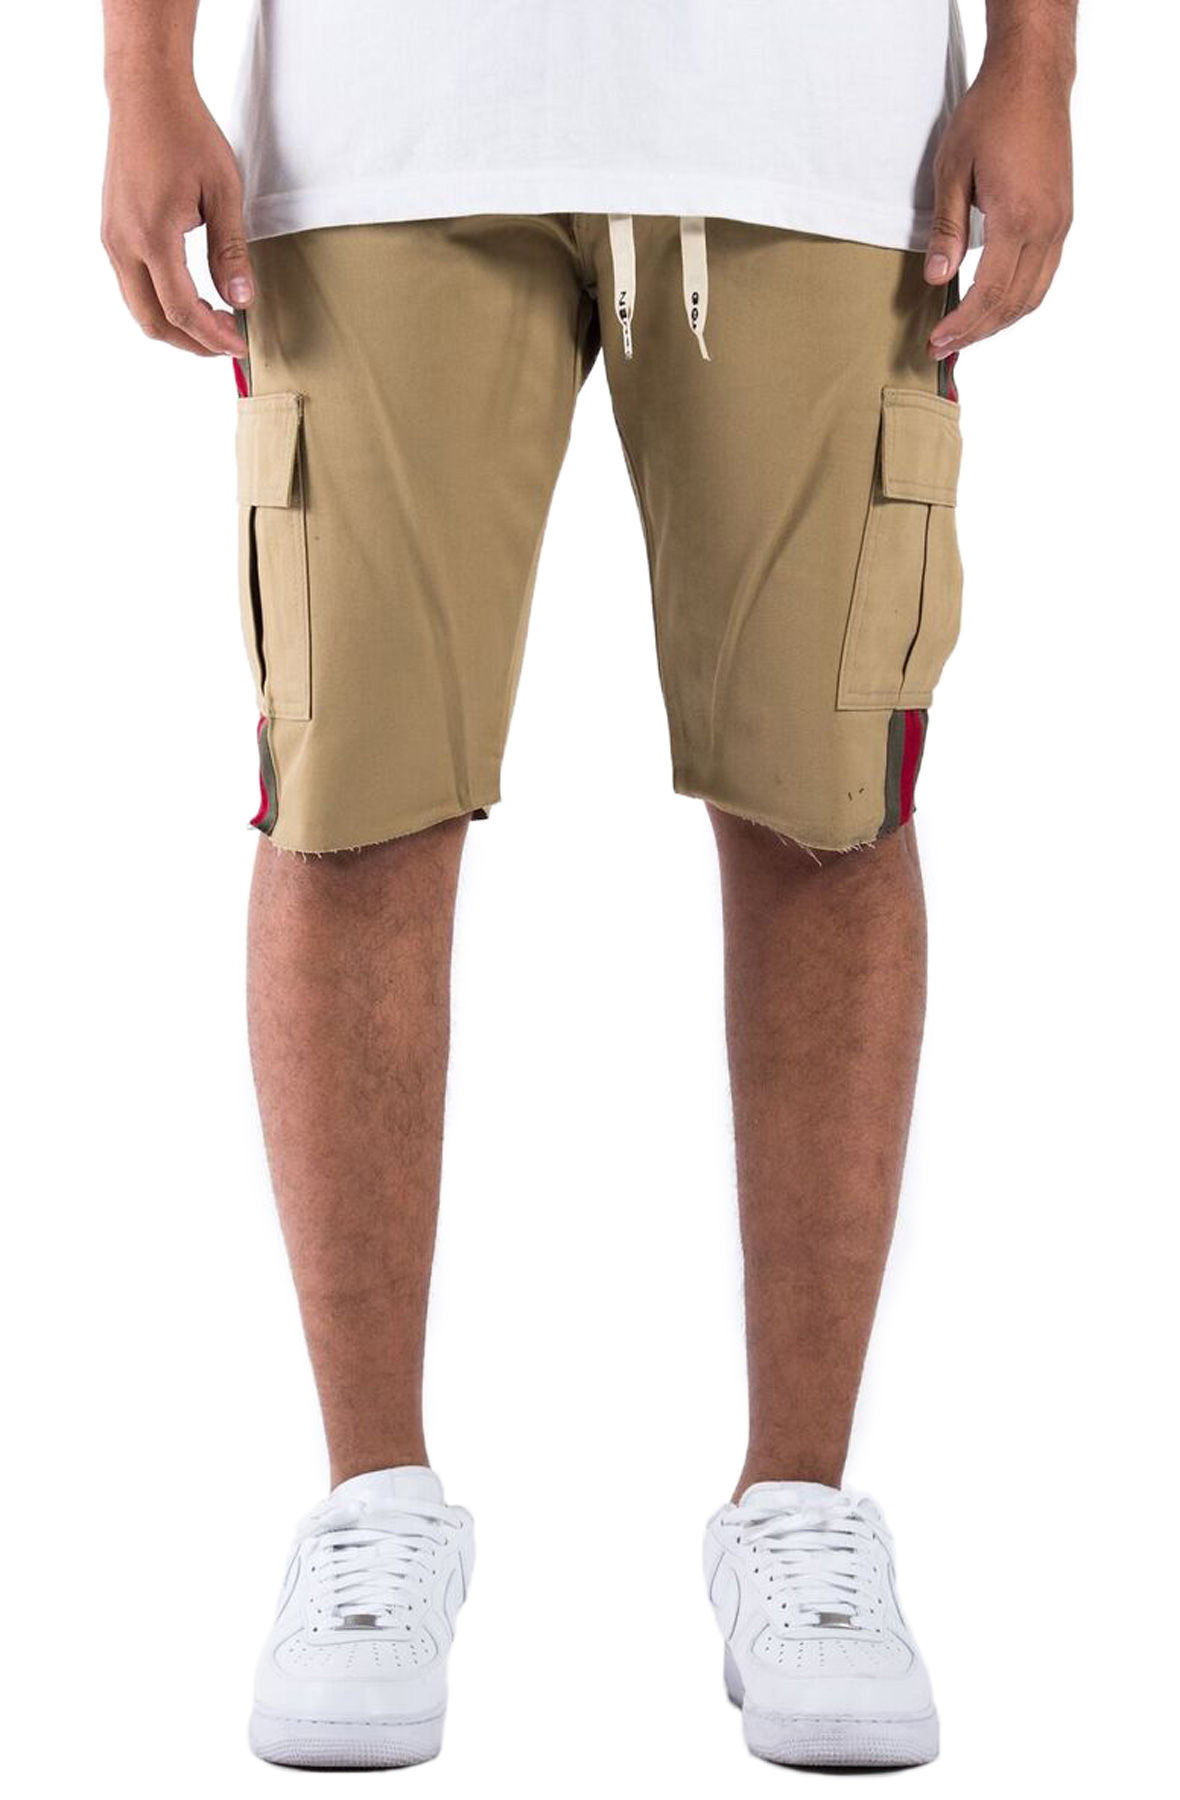 The Union Cargo Twill Shorts in Tan Italia Luxe